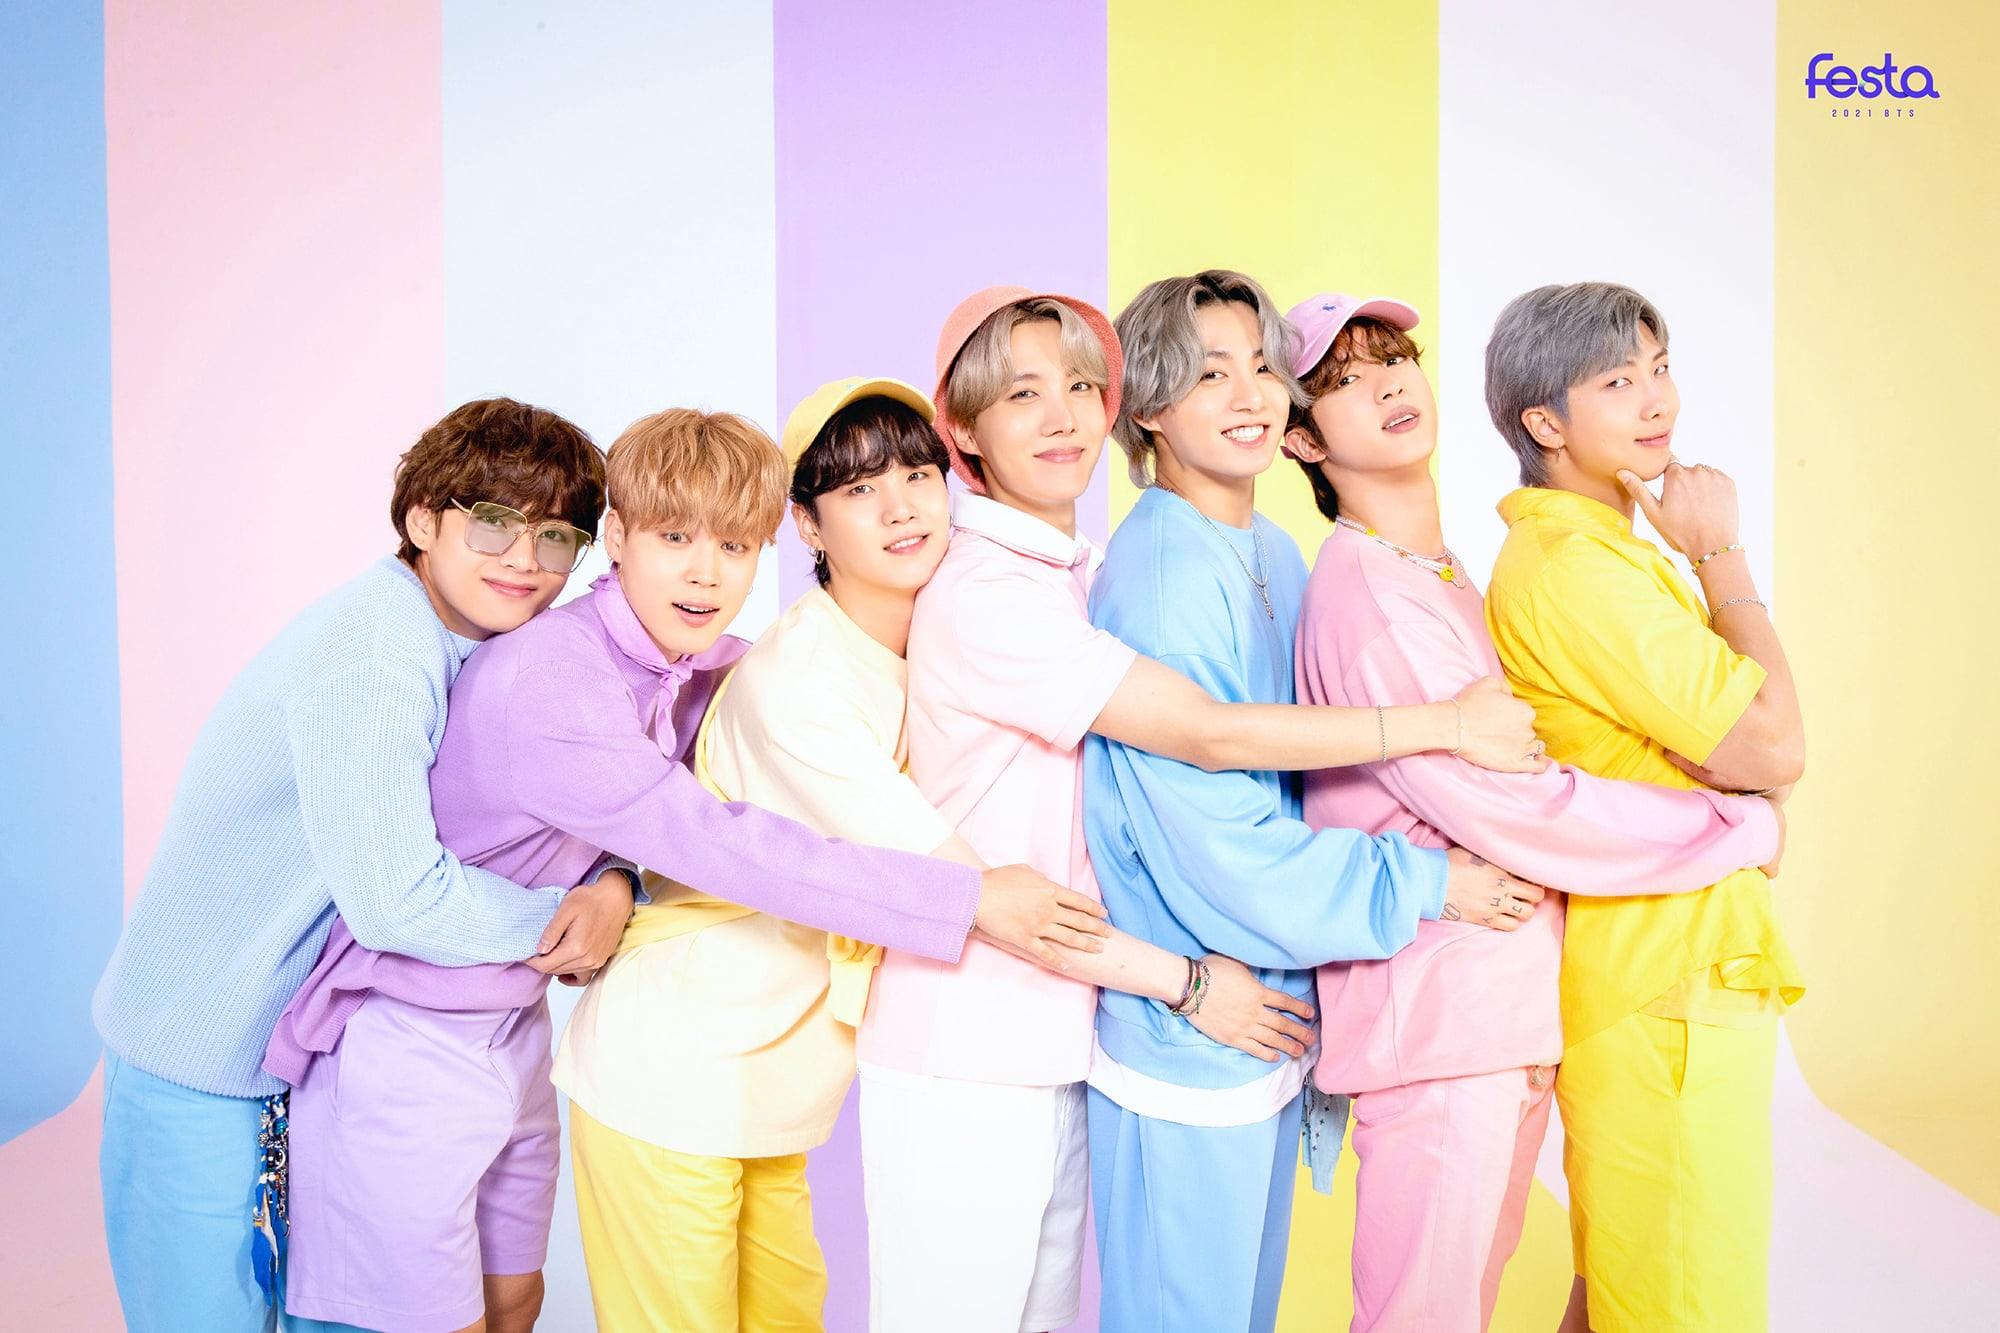 BTS Kicks Off 20 Festa With Adorable Family Portraits   Soompi